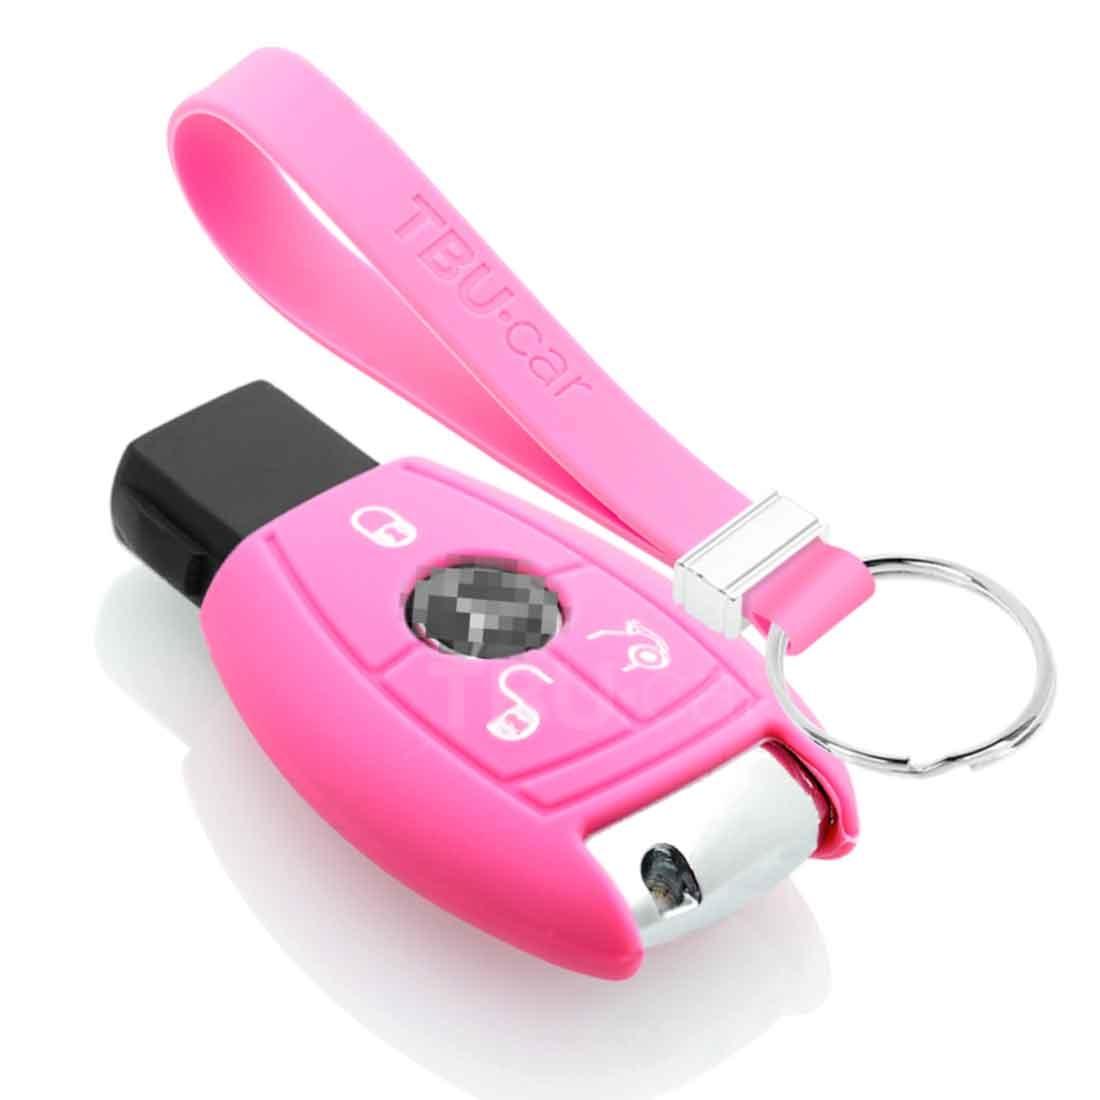 TBU car TBU car Sleutel cover compatibel met Mercedes - Silicone sleutelhoesje - beschermhoesje autosleutel - Roze